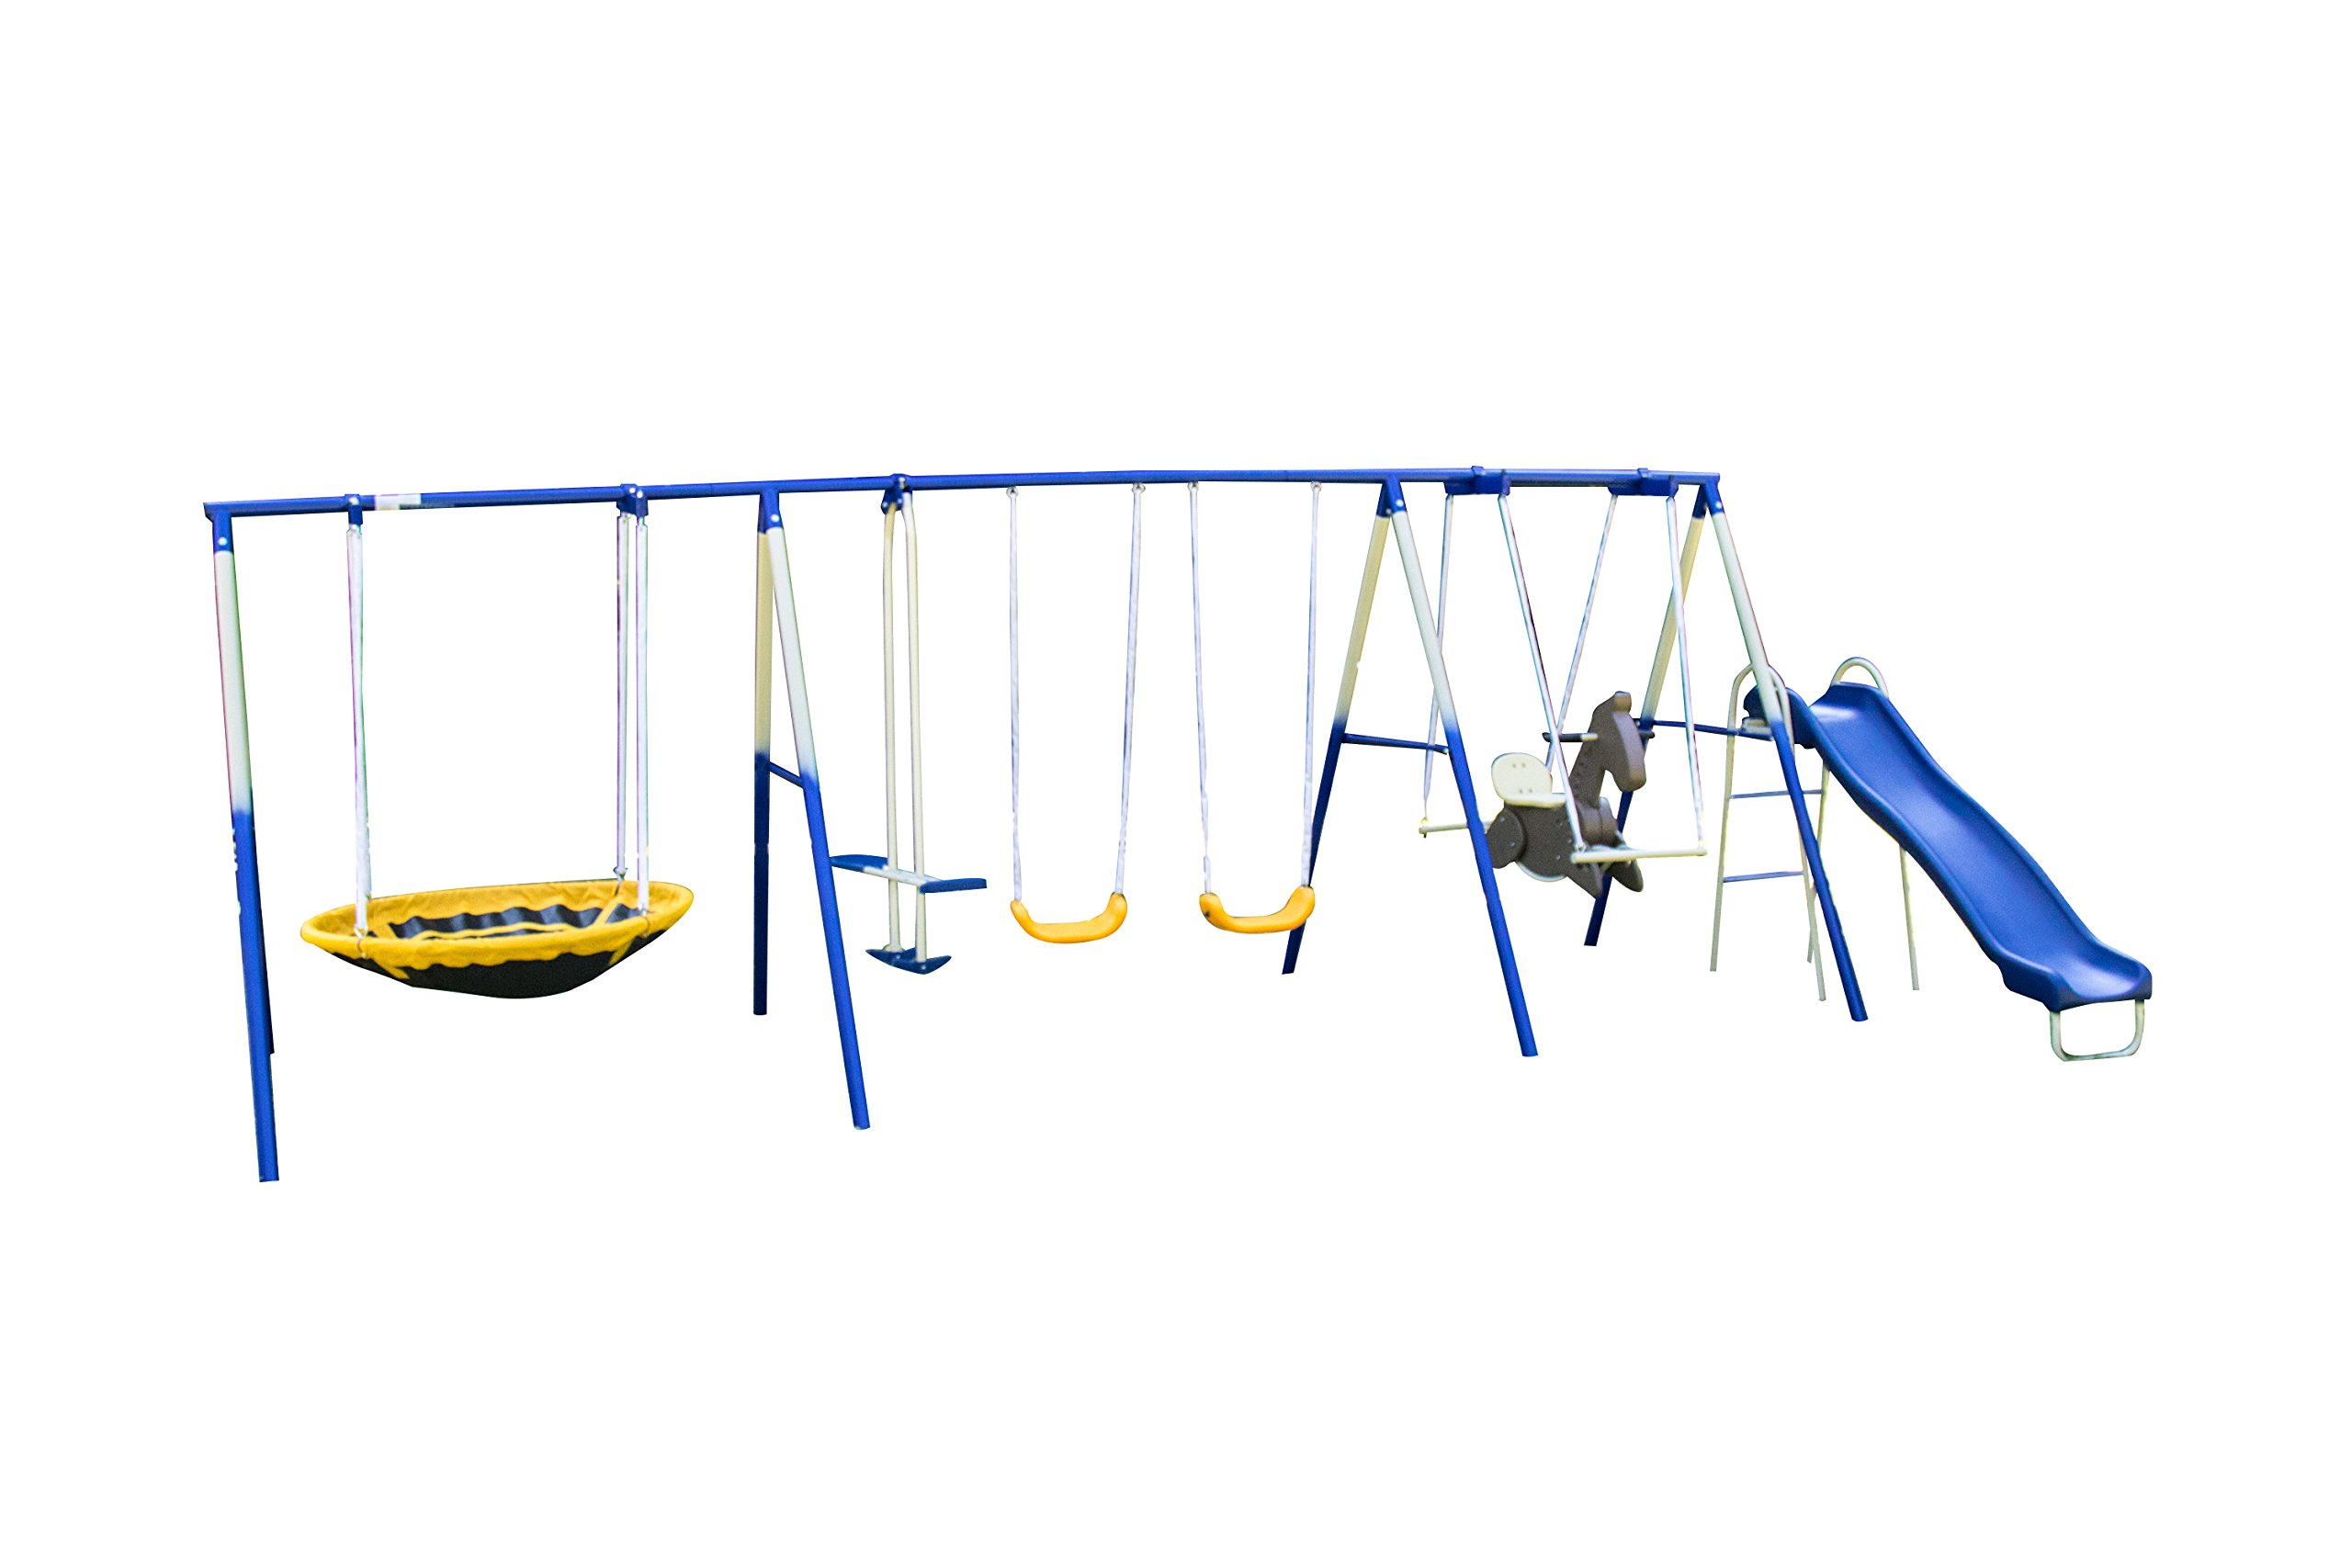 Sportspower Super 8 Fun Metal Swing Set by Sportspower (Image #1)